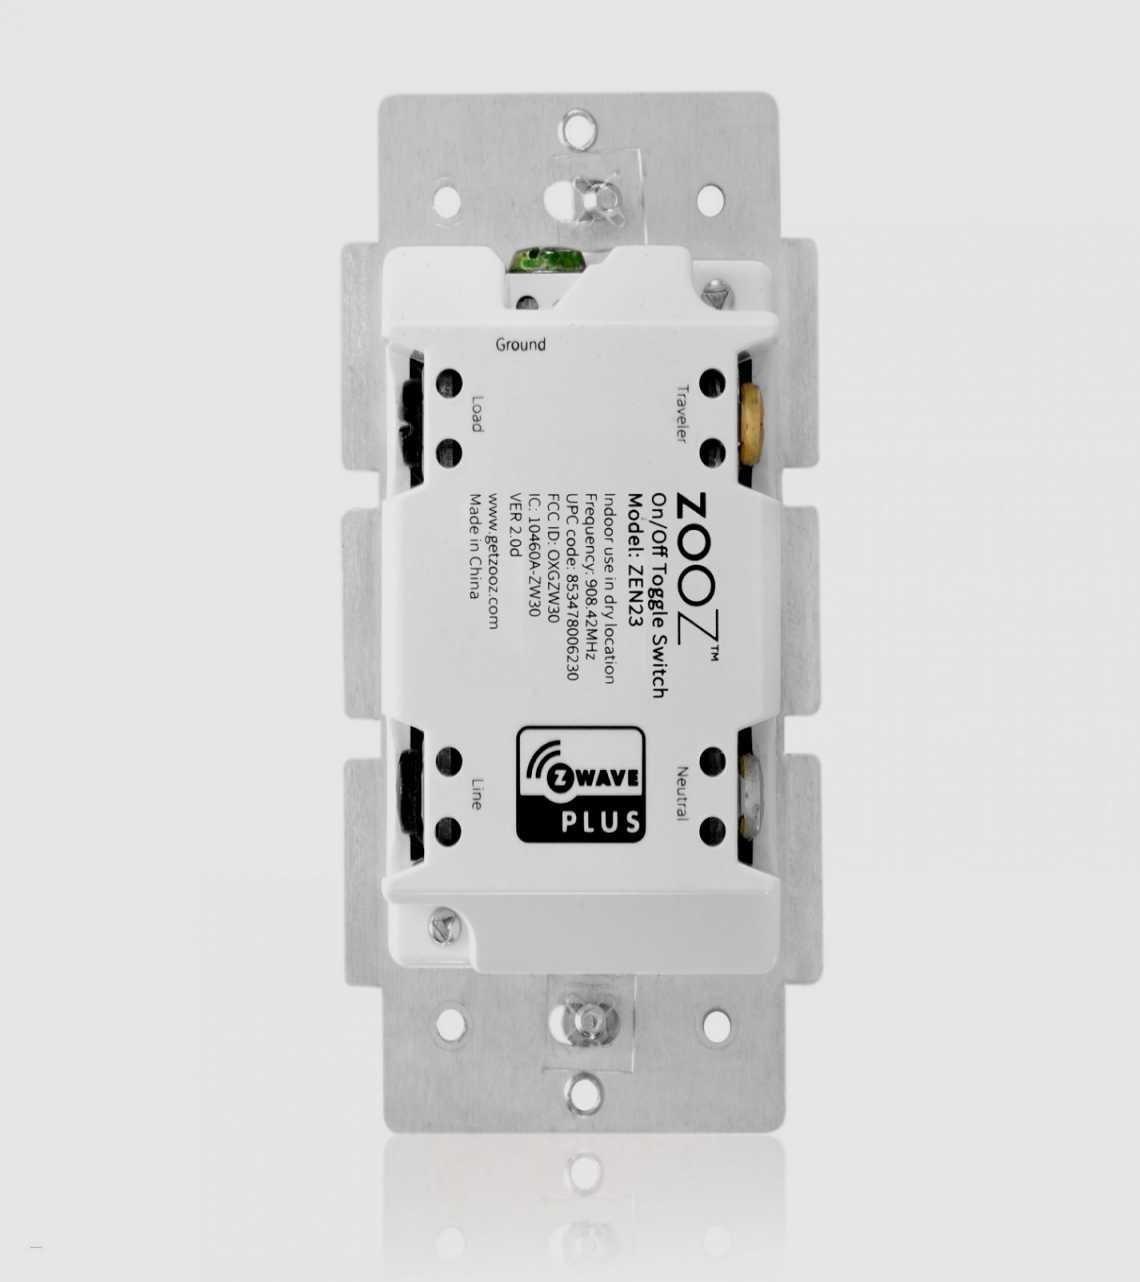 Auto Gauge Boost Gauge Wiring Diagram How to Wire 3 Way Light Switch Diagram Fresh Wiring Diagram Switch